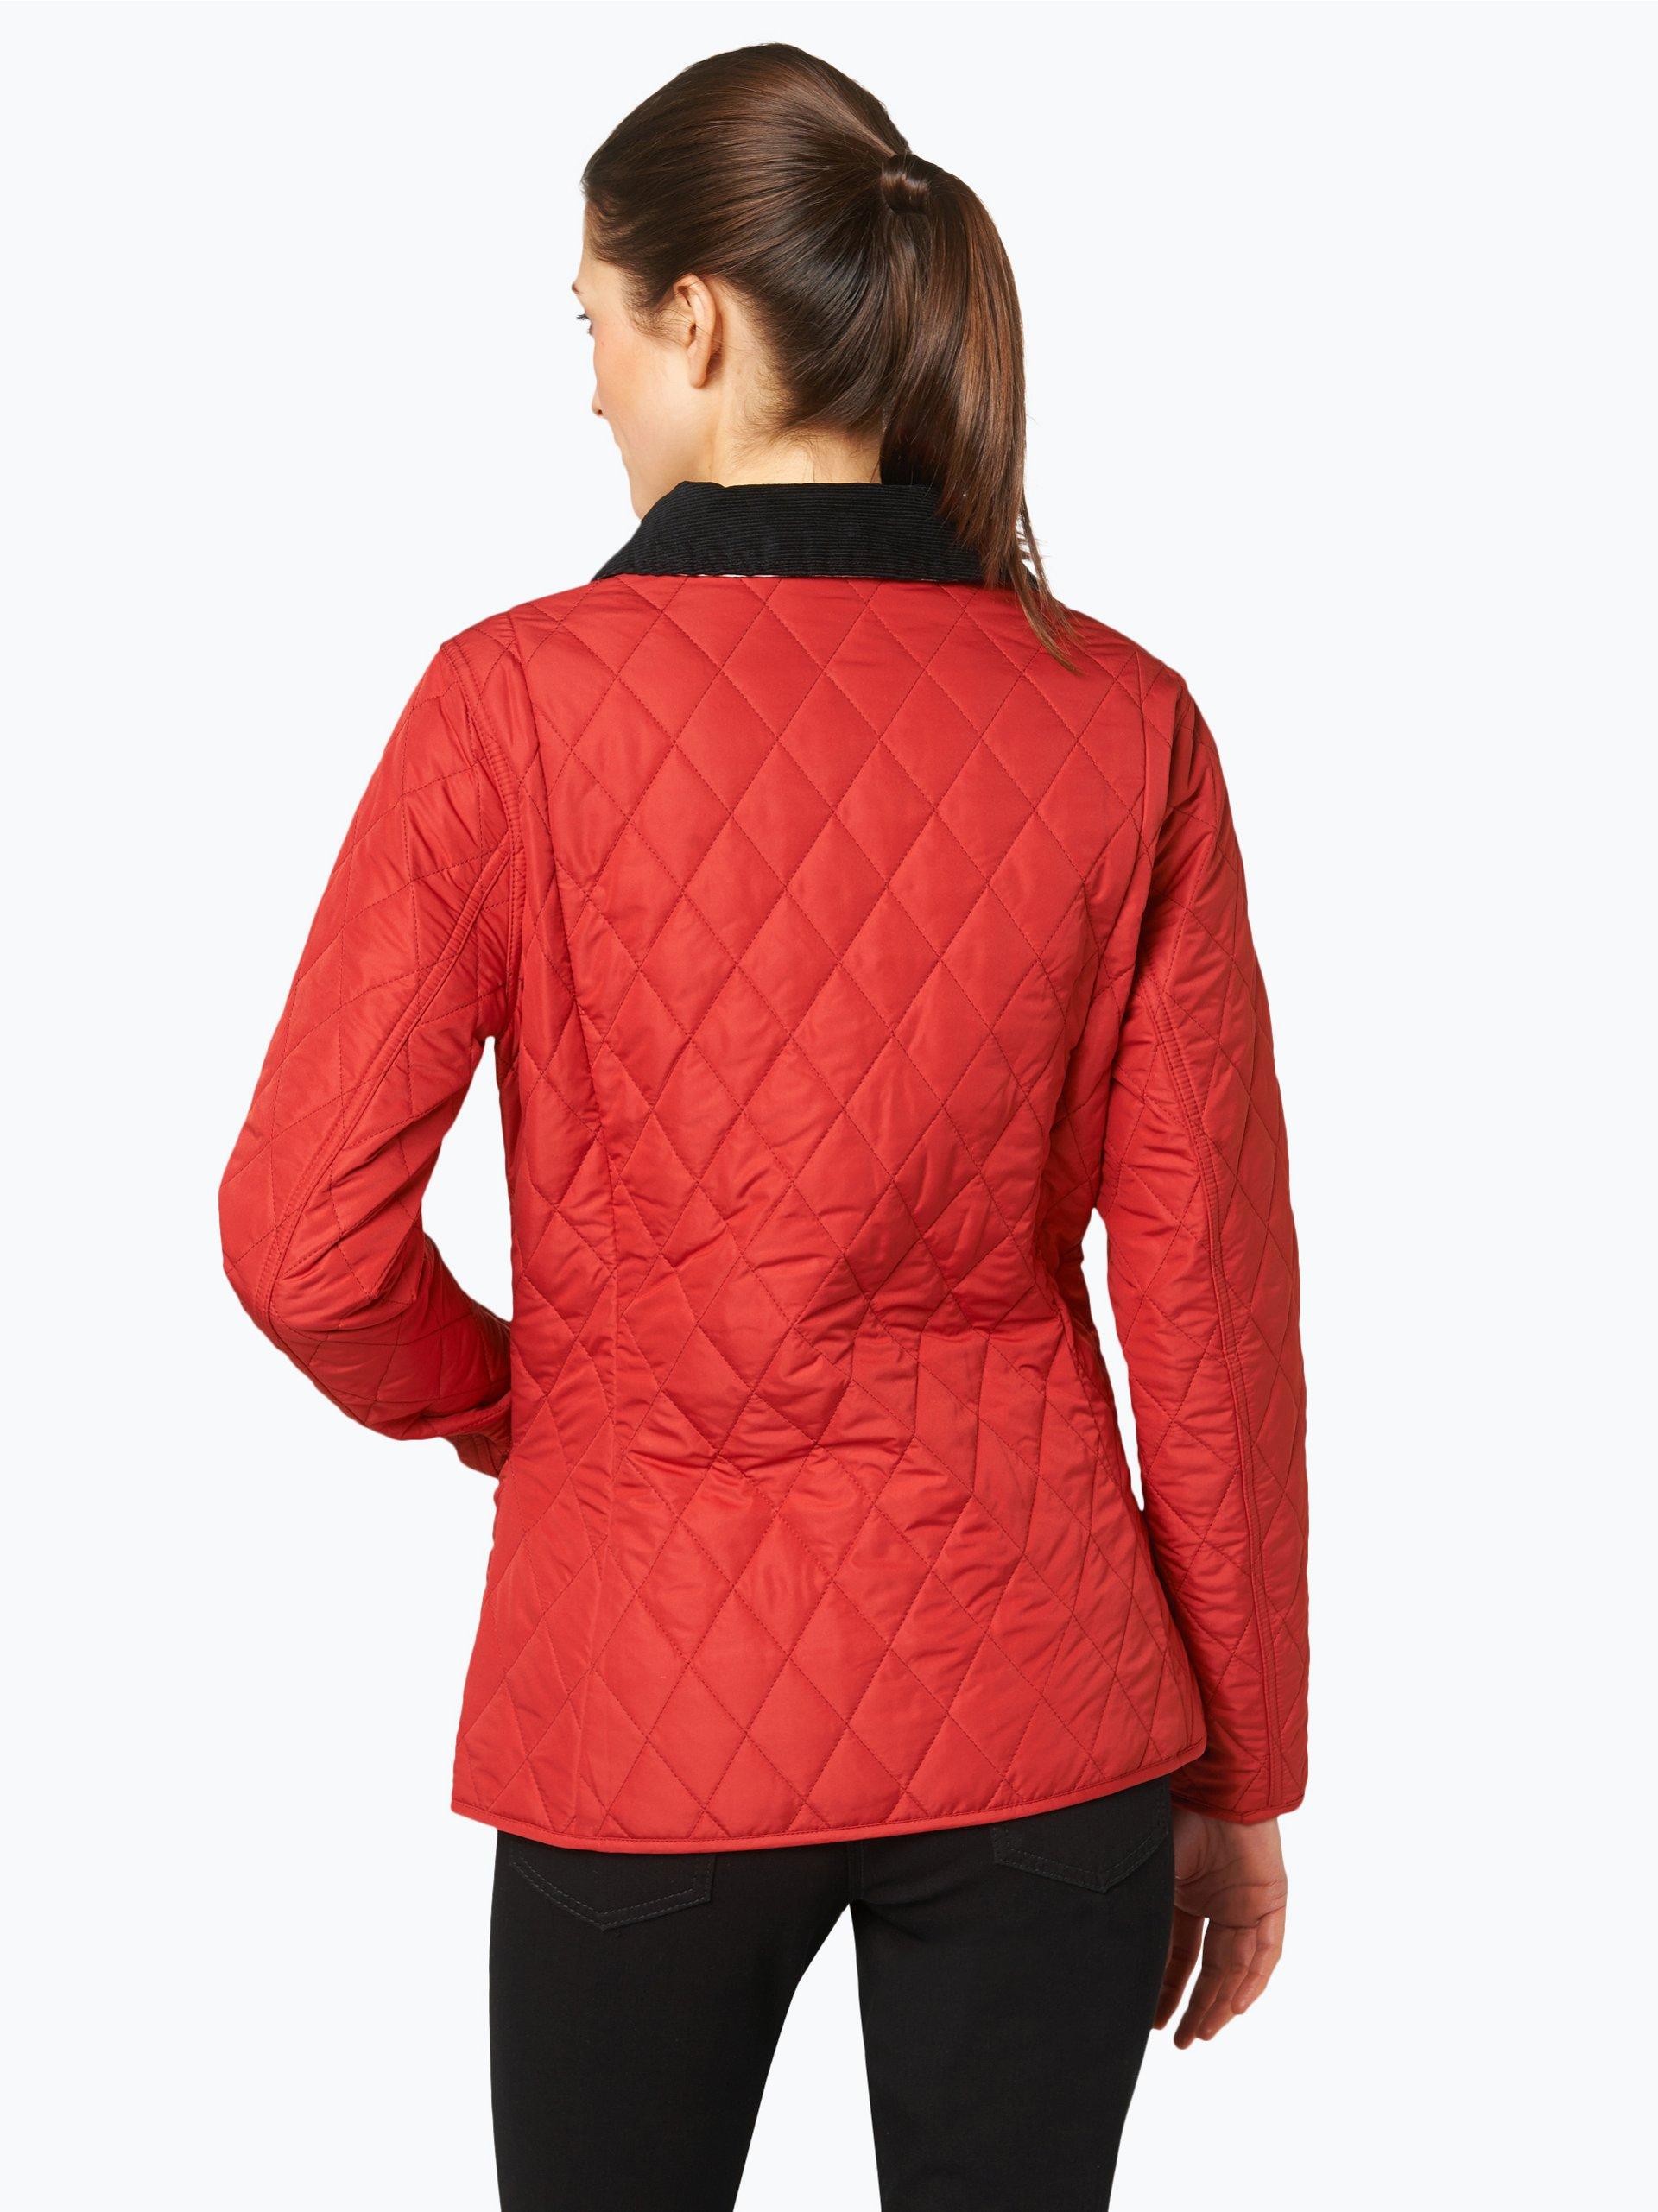 barbour damen steppjacke rot uni online kaufen peek und cloppenburg de. Black Bedroom Furniture Sets. Home Design Ideas